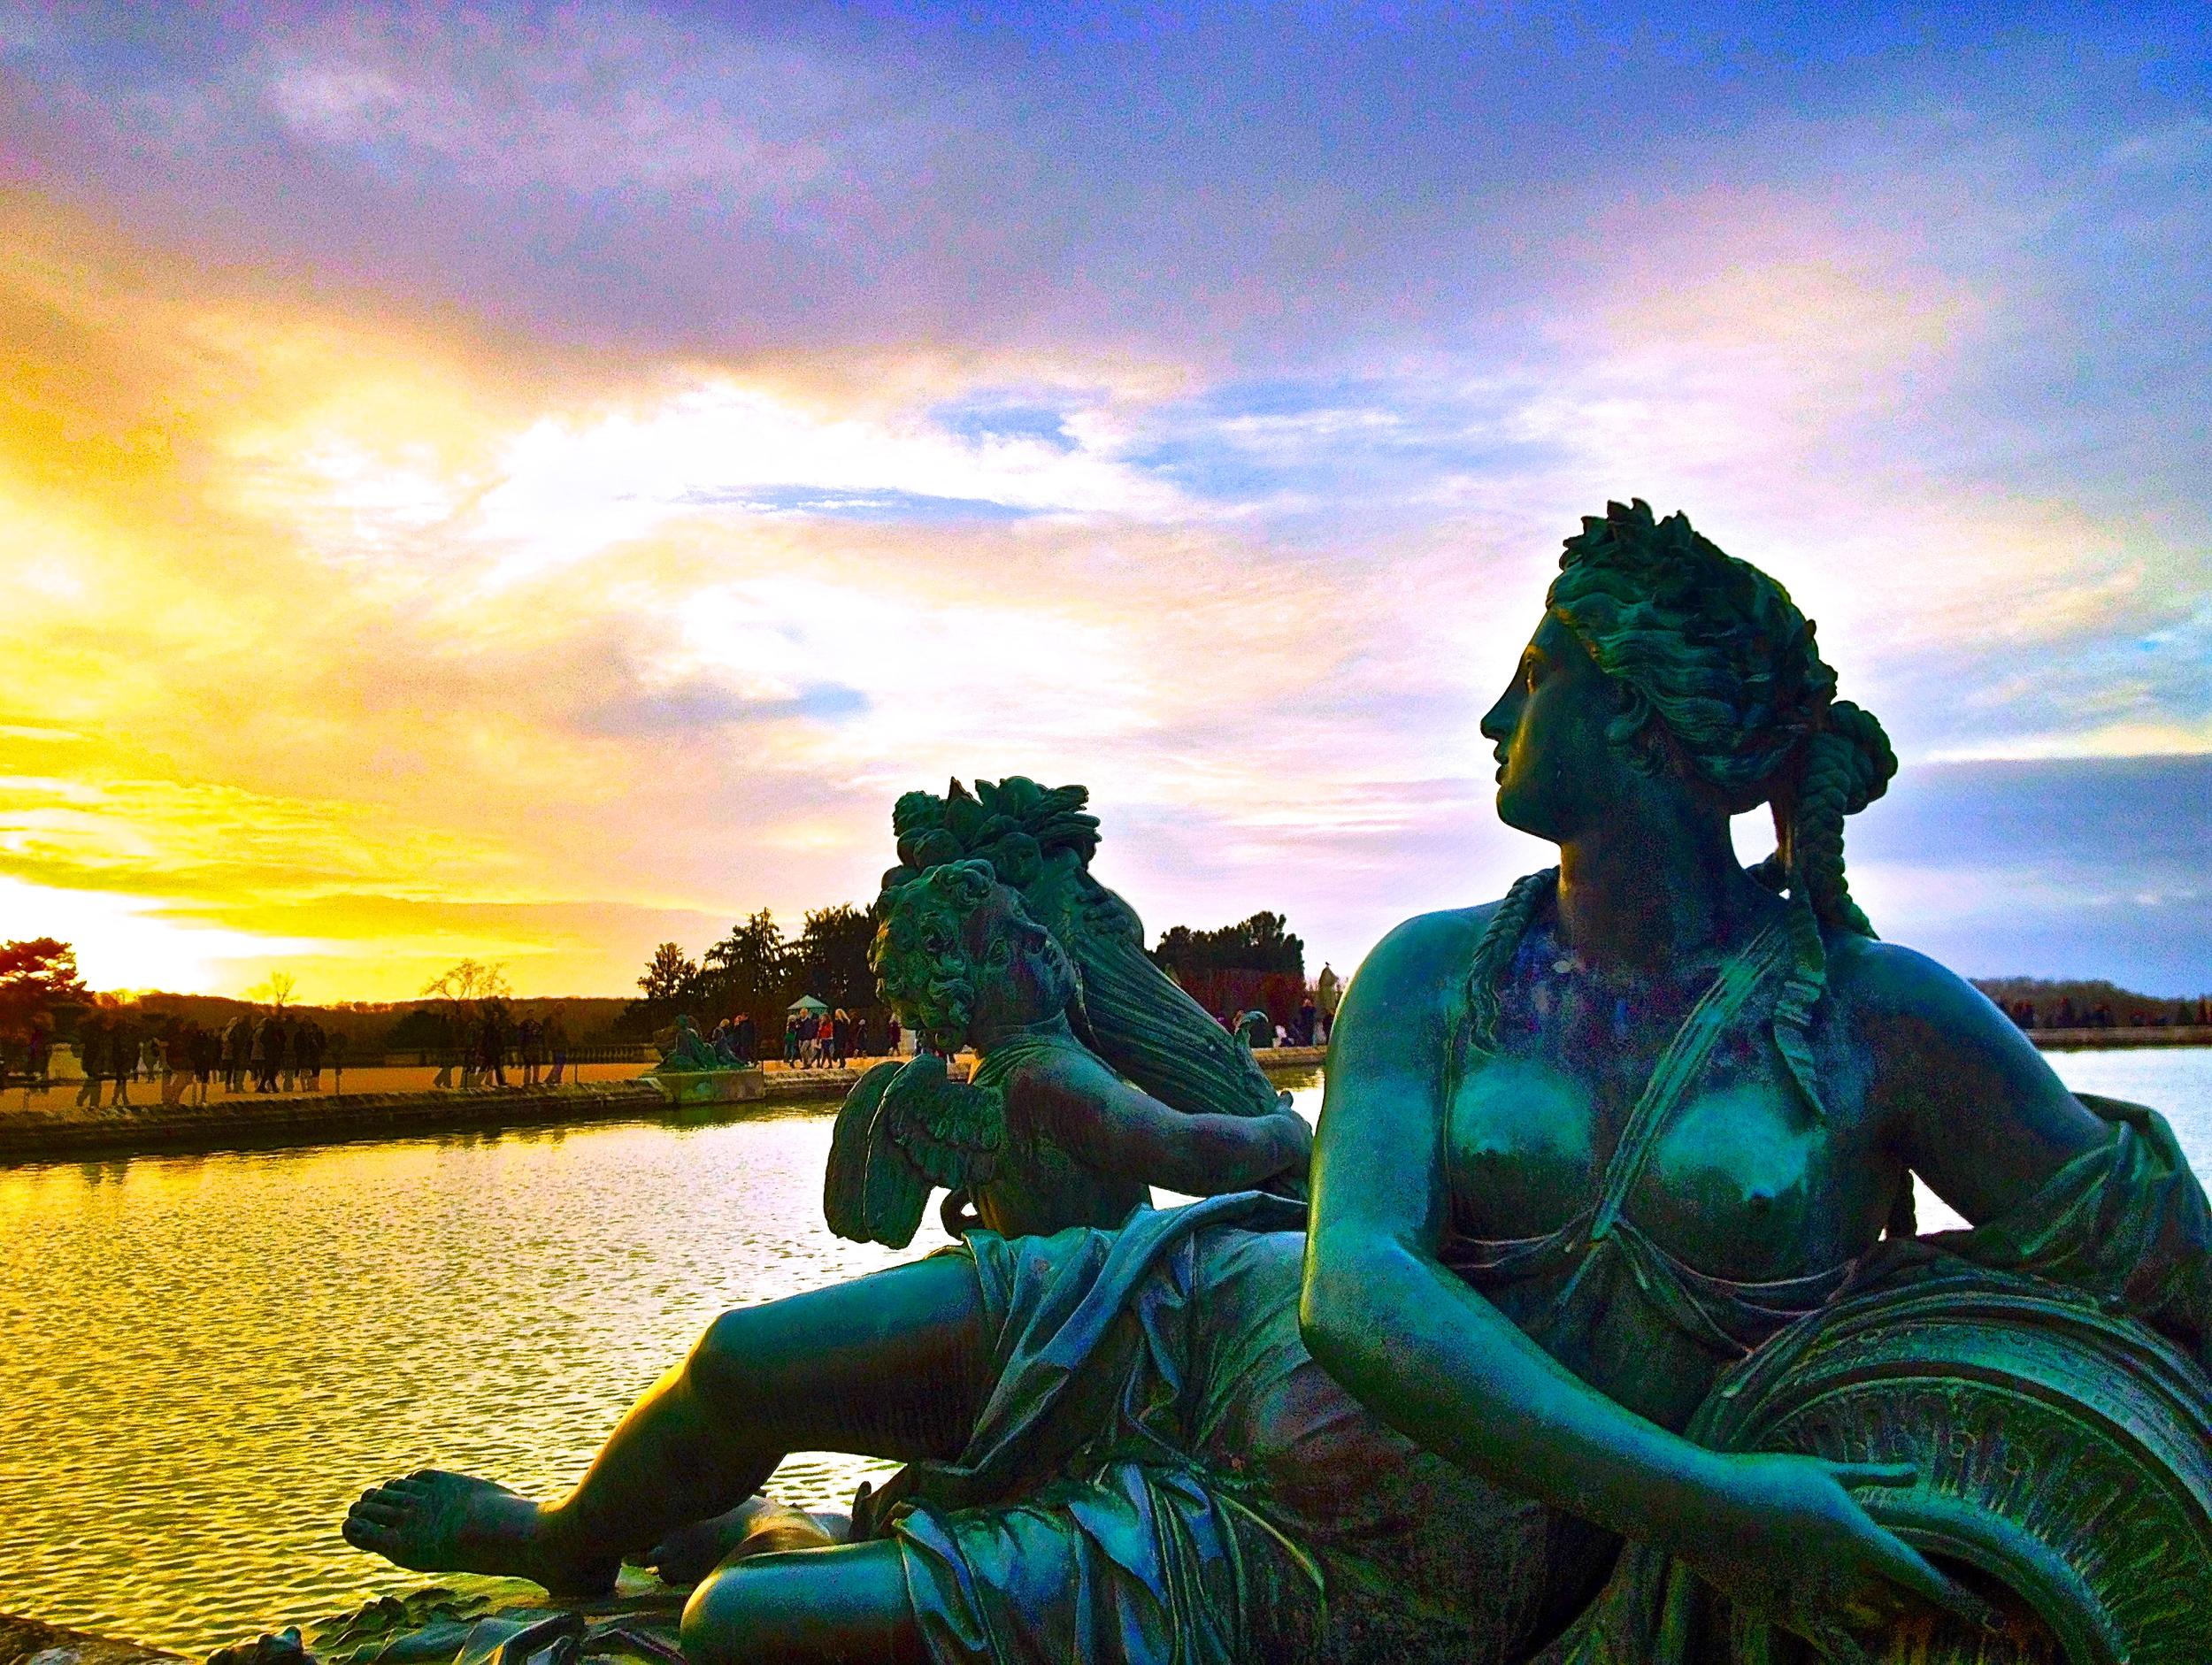 Garden of Versailles at sunset, Palace De Versailles, France